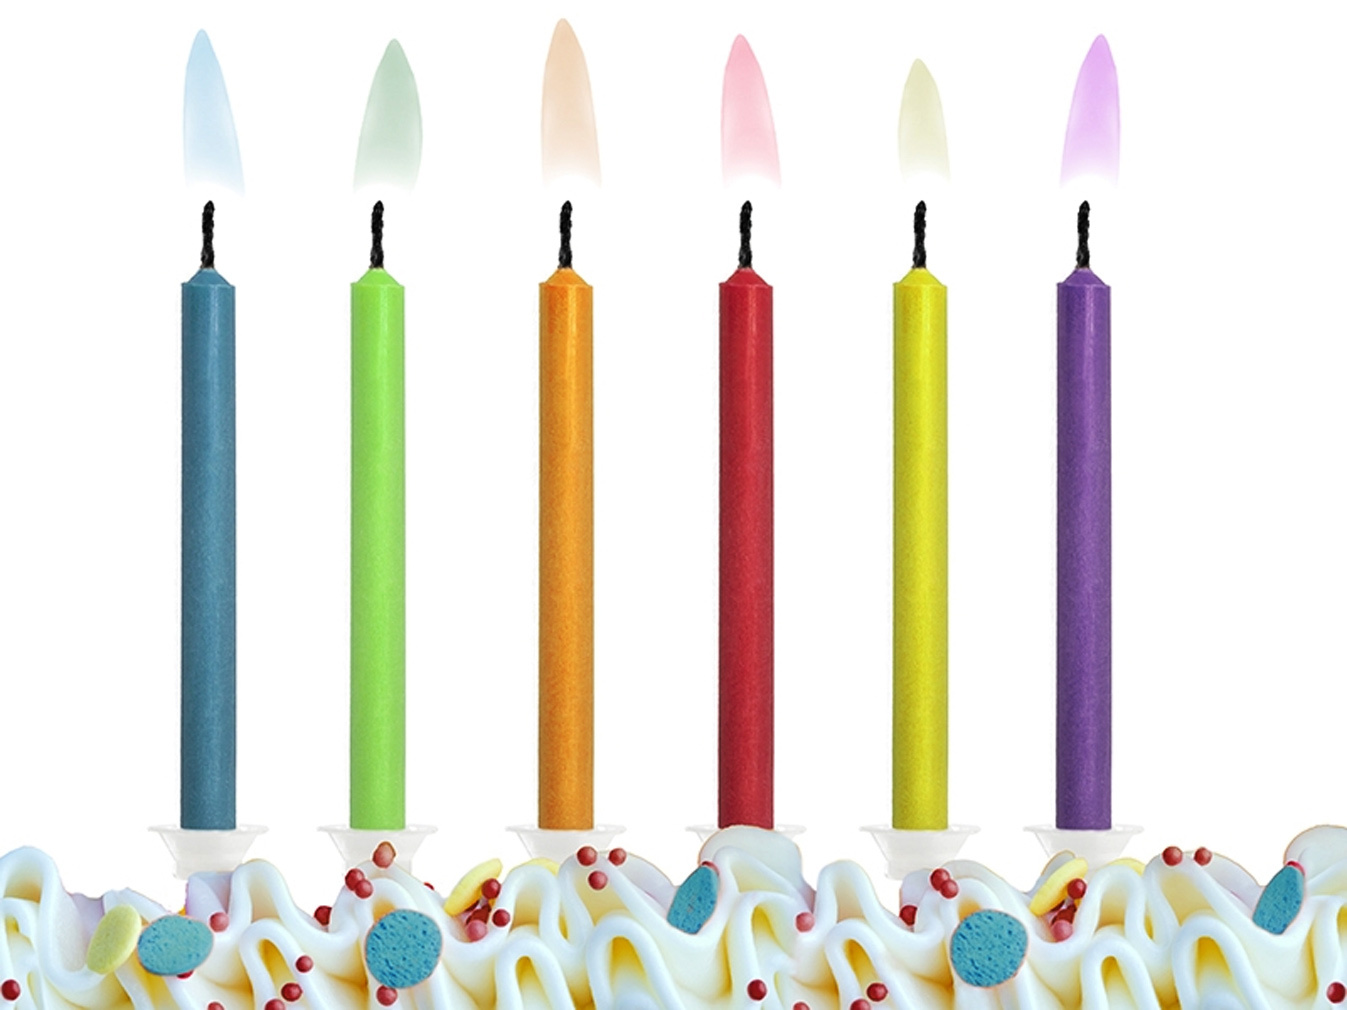 50 kerzen mit farbiger bunter flamme geburtstagskerze. Black Bedroom Furniture Sets. Home Design Ideas